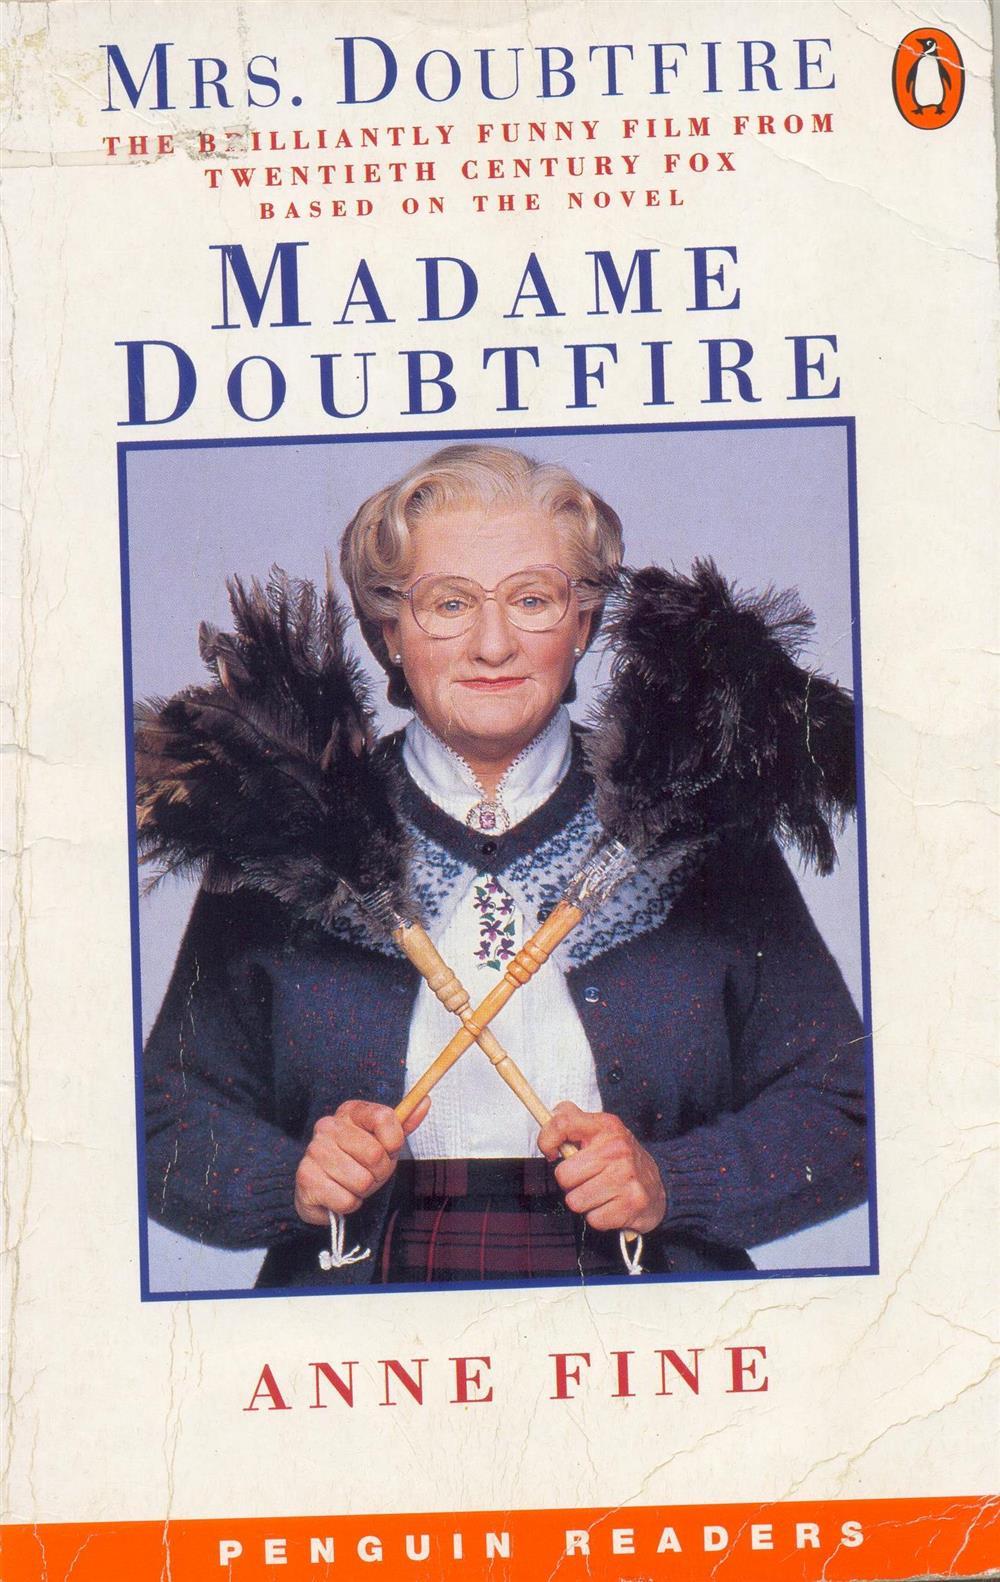 Madame Doubtfire 001.jpg